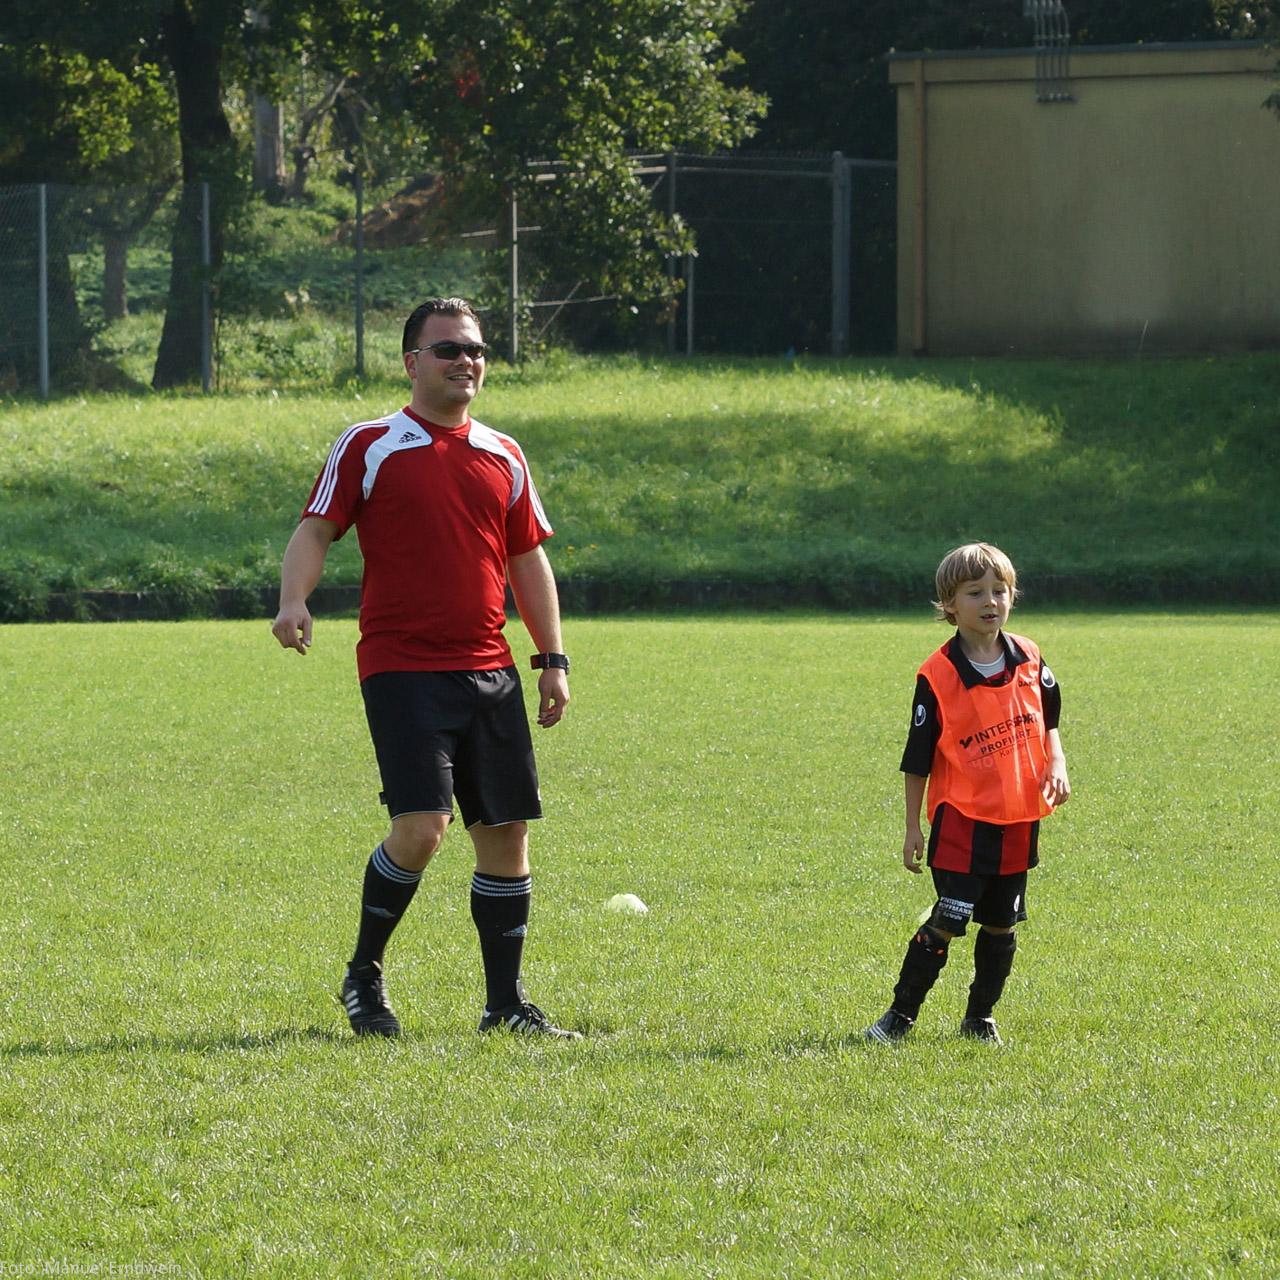 (c) Sportfoto EMANUEL - 20130922-1-0022